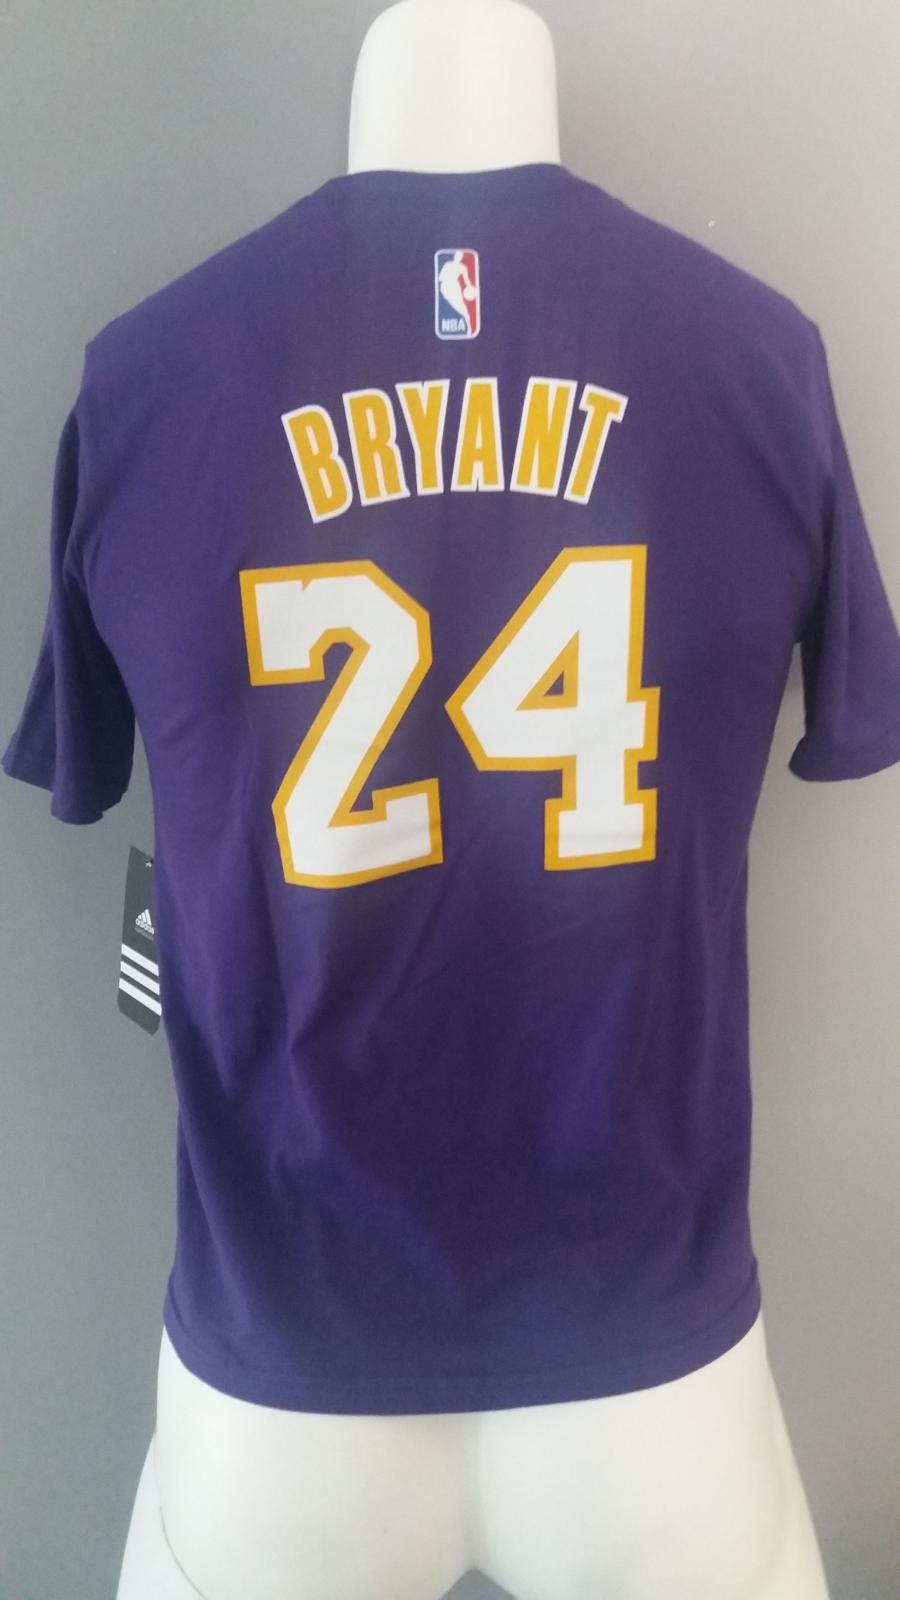 Jersey - T-shirt - Joven - Kobe Bryant - Los Angeles Lakers - Alternate - Adidas